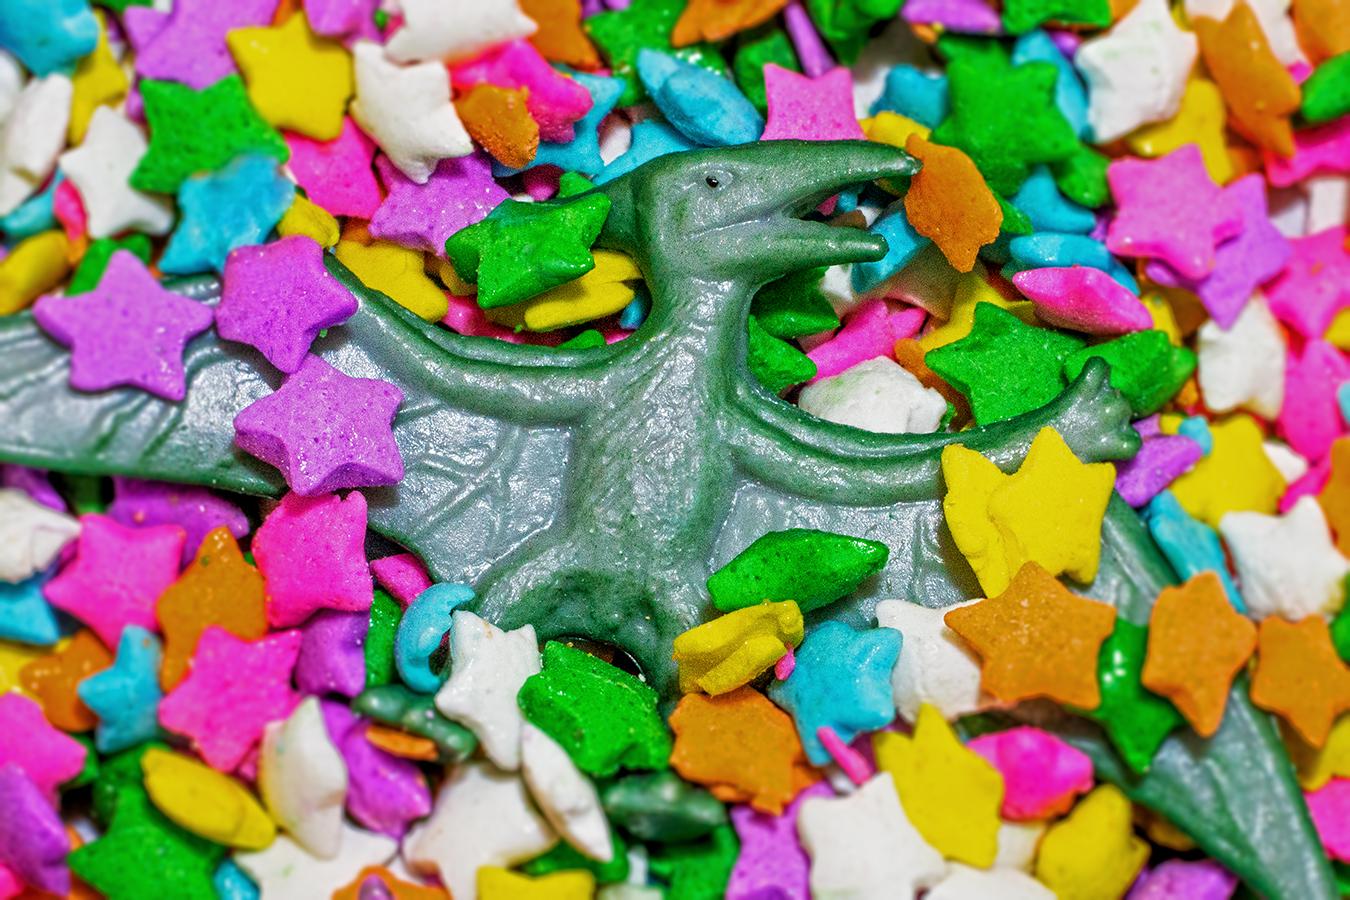 Victoria_Meng_Project2_Sprinkles_Dinosaur_Still_Life_Rainbow_Macro_Pteradon_Bokeh_Candy